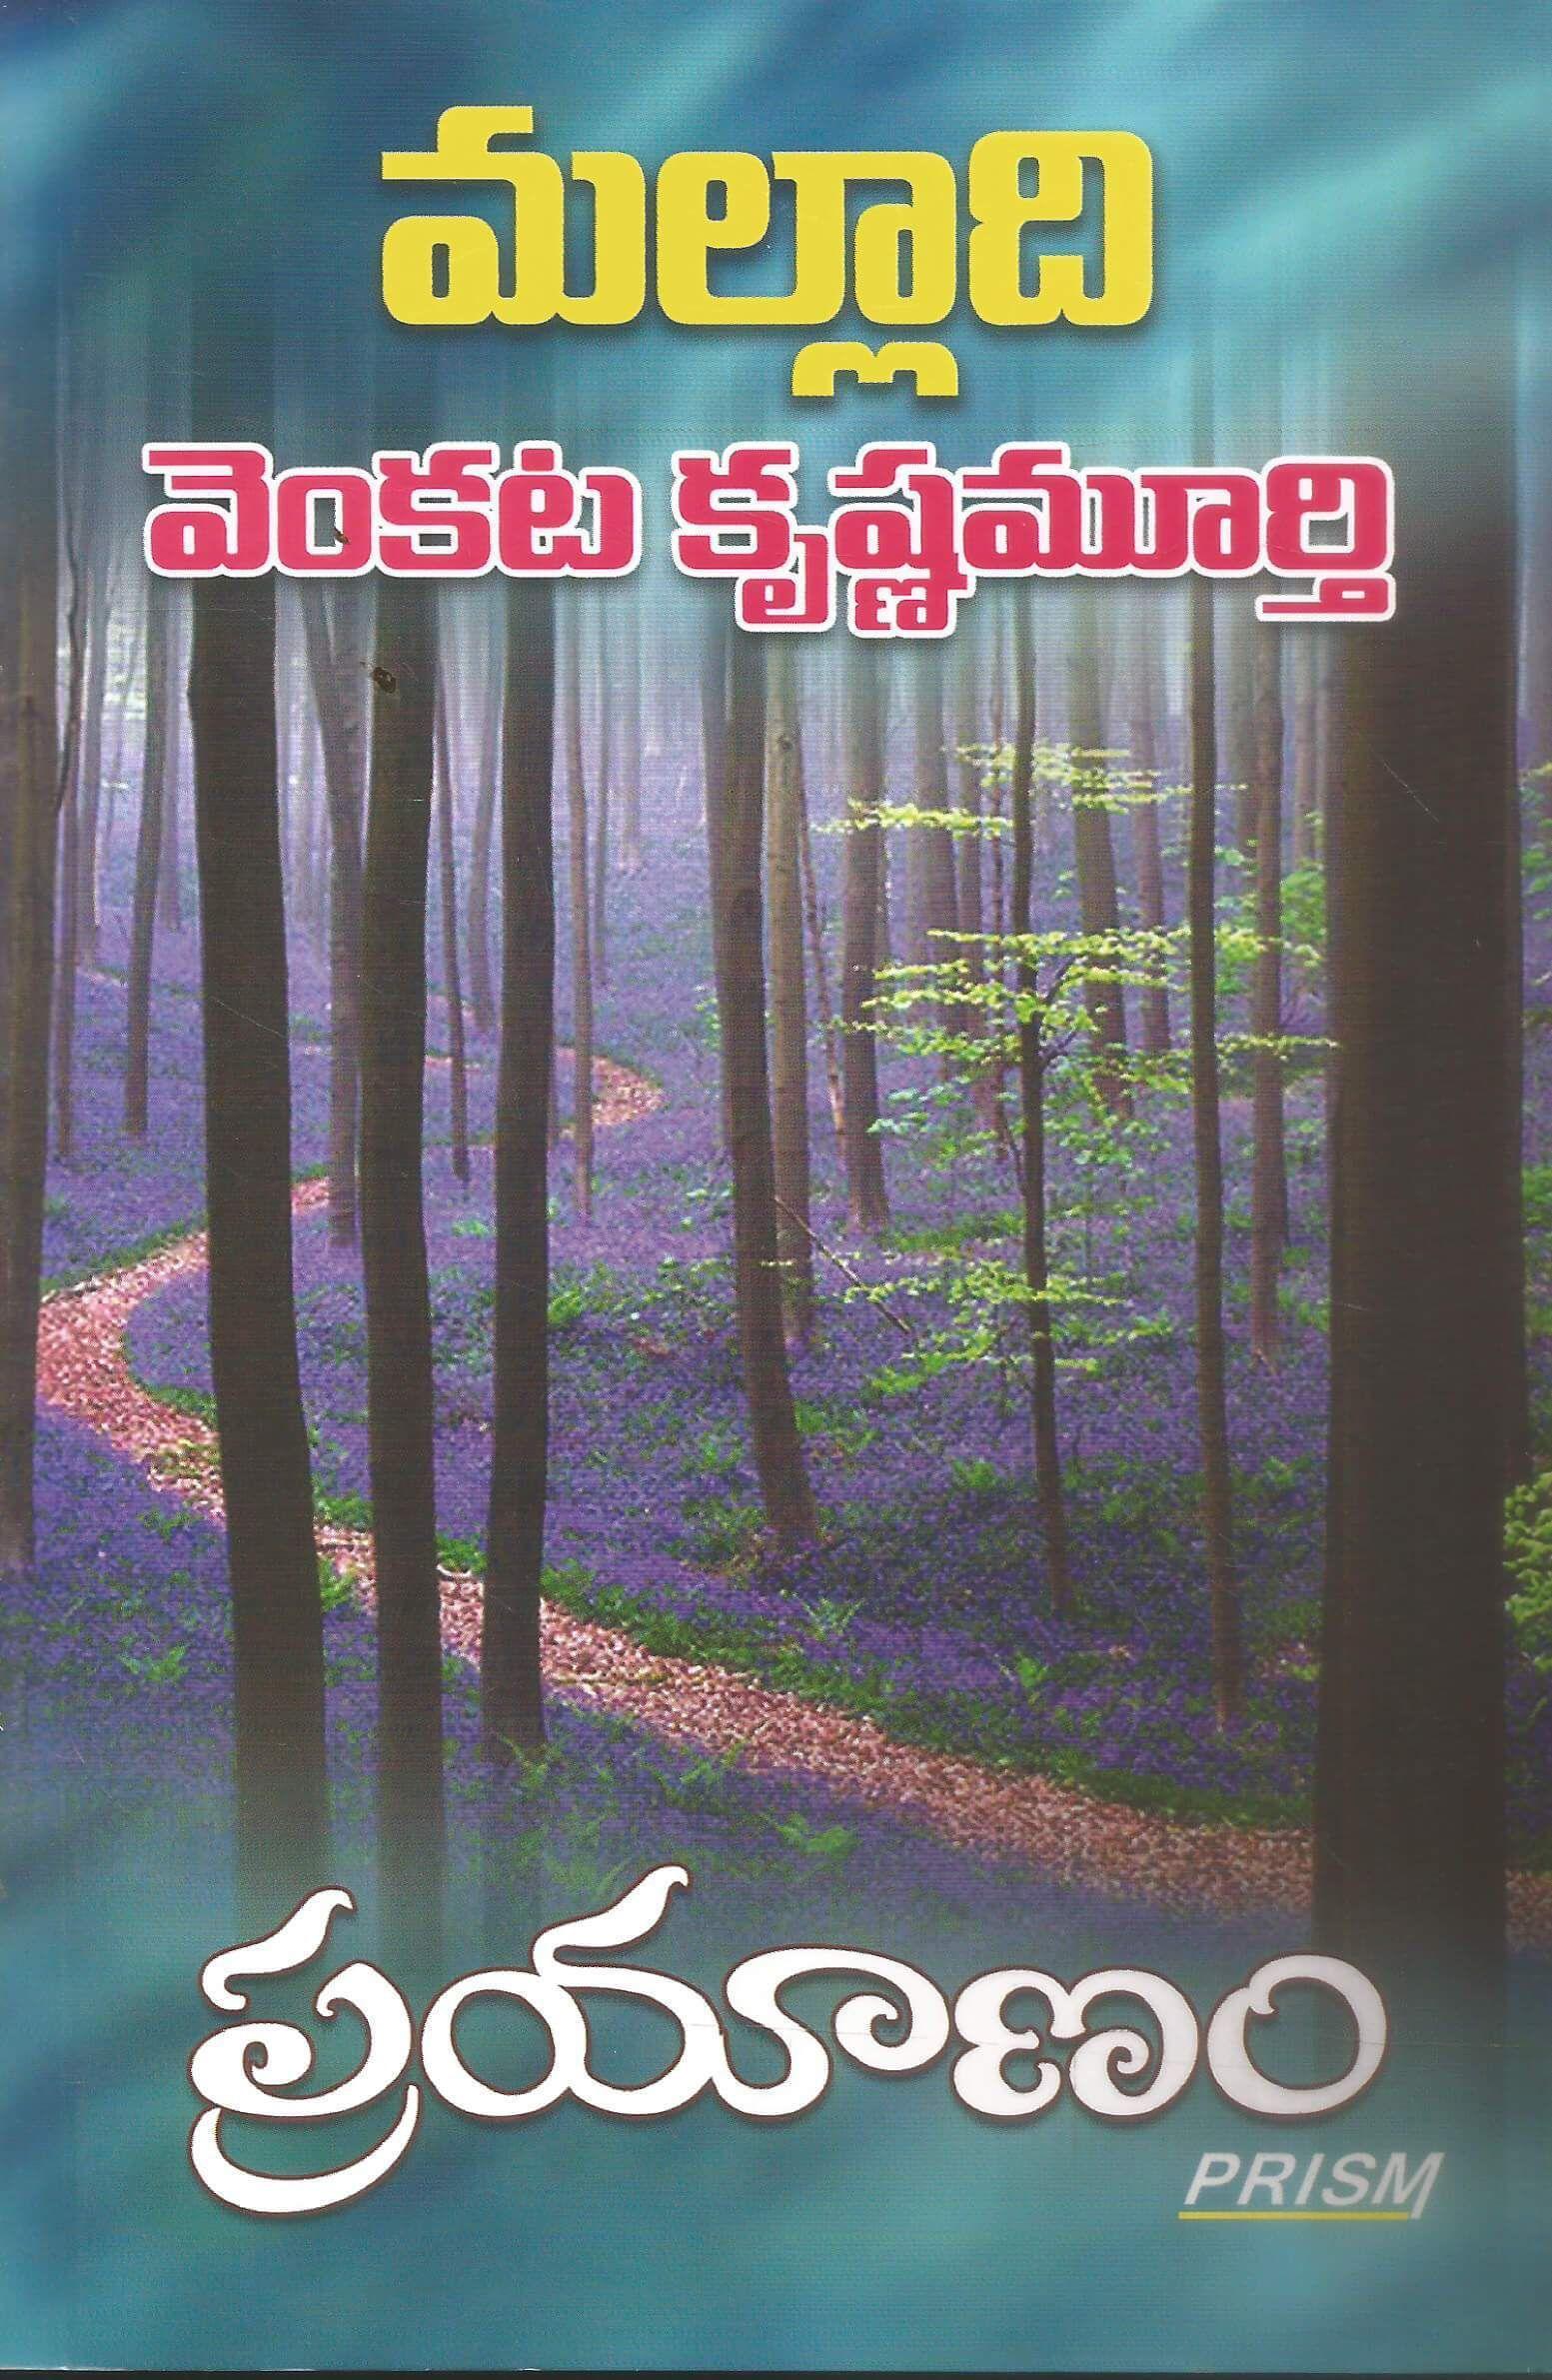 Pin by TeluguBooks.in on Best Selling Telugu Books in 2019